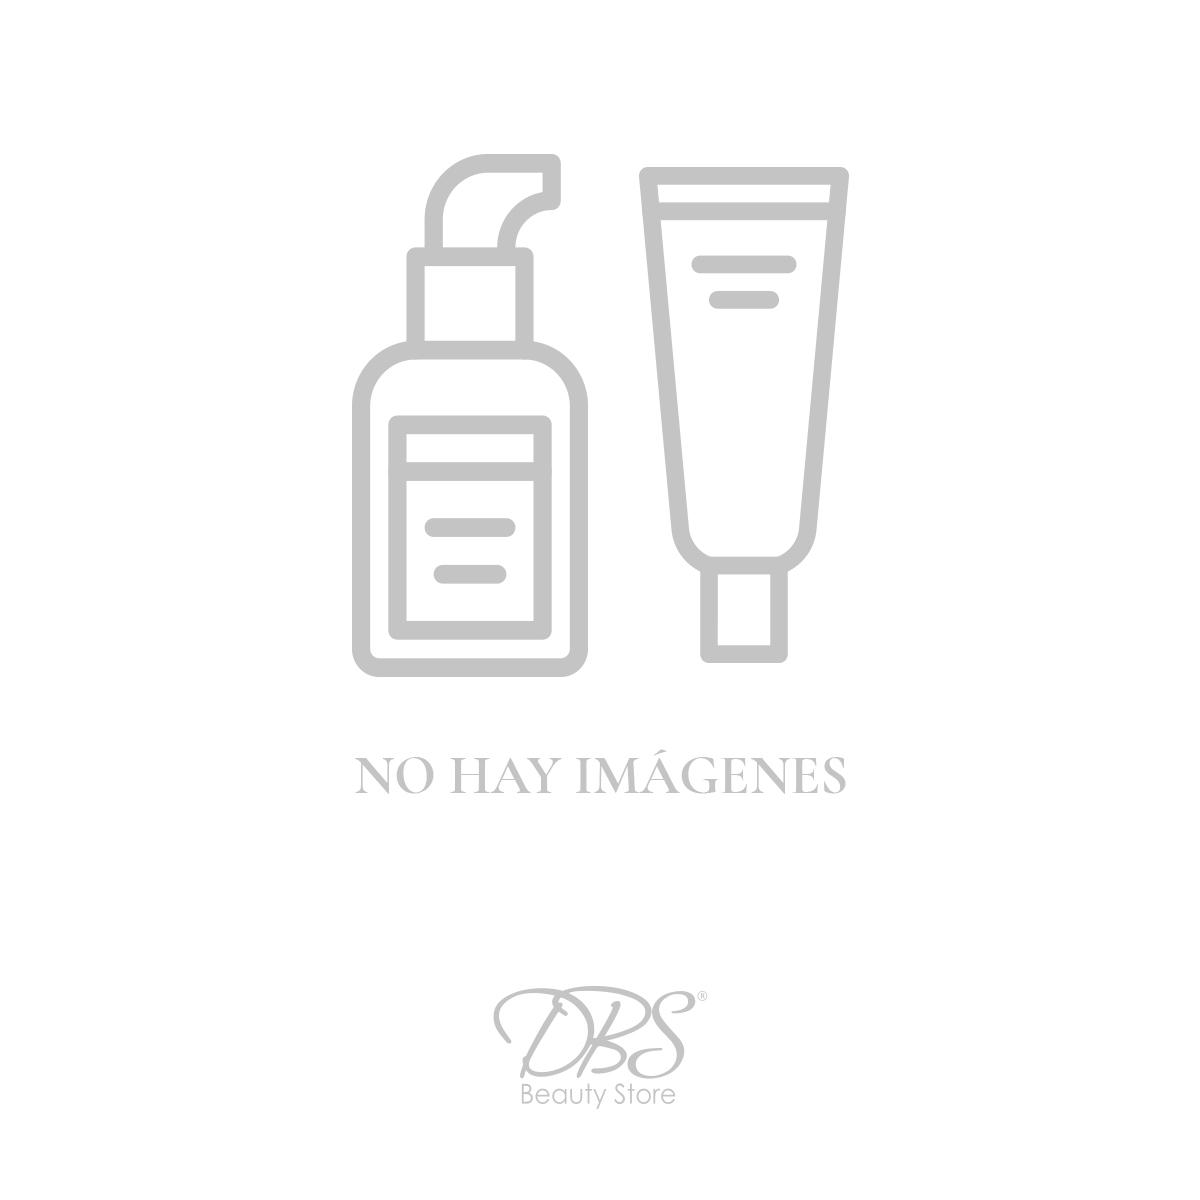 Shampoo Protección Color Extend Magnetics